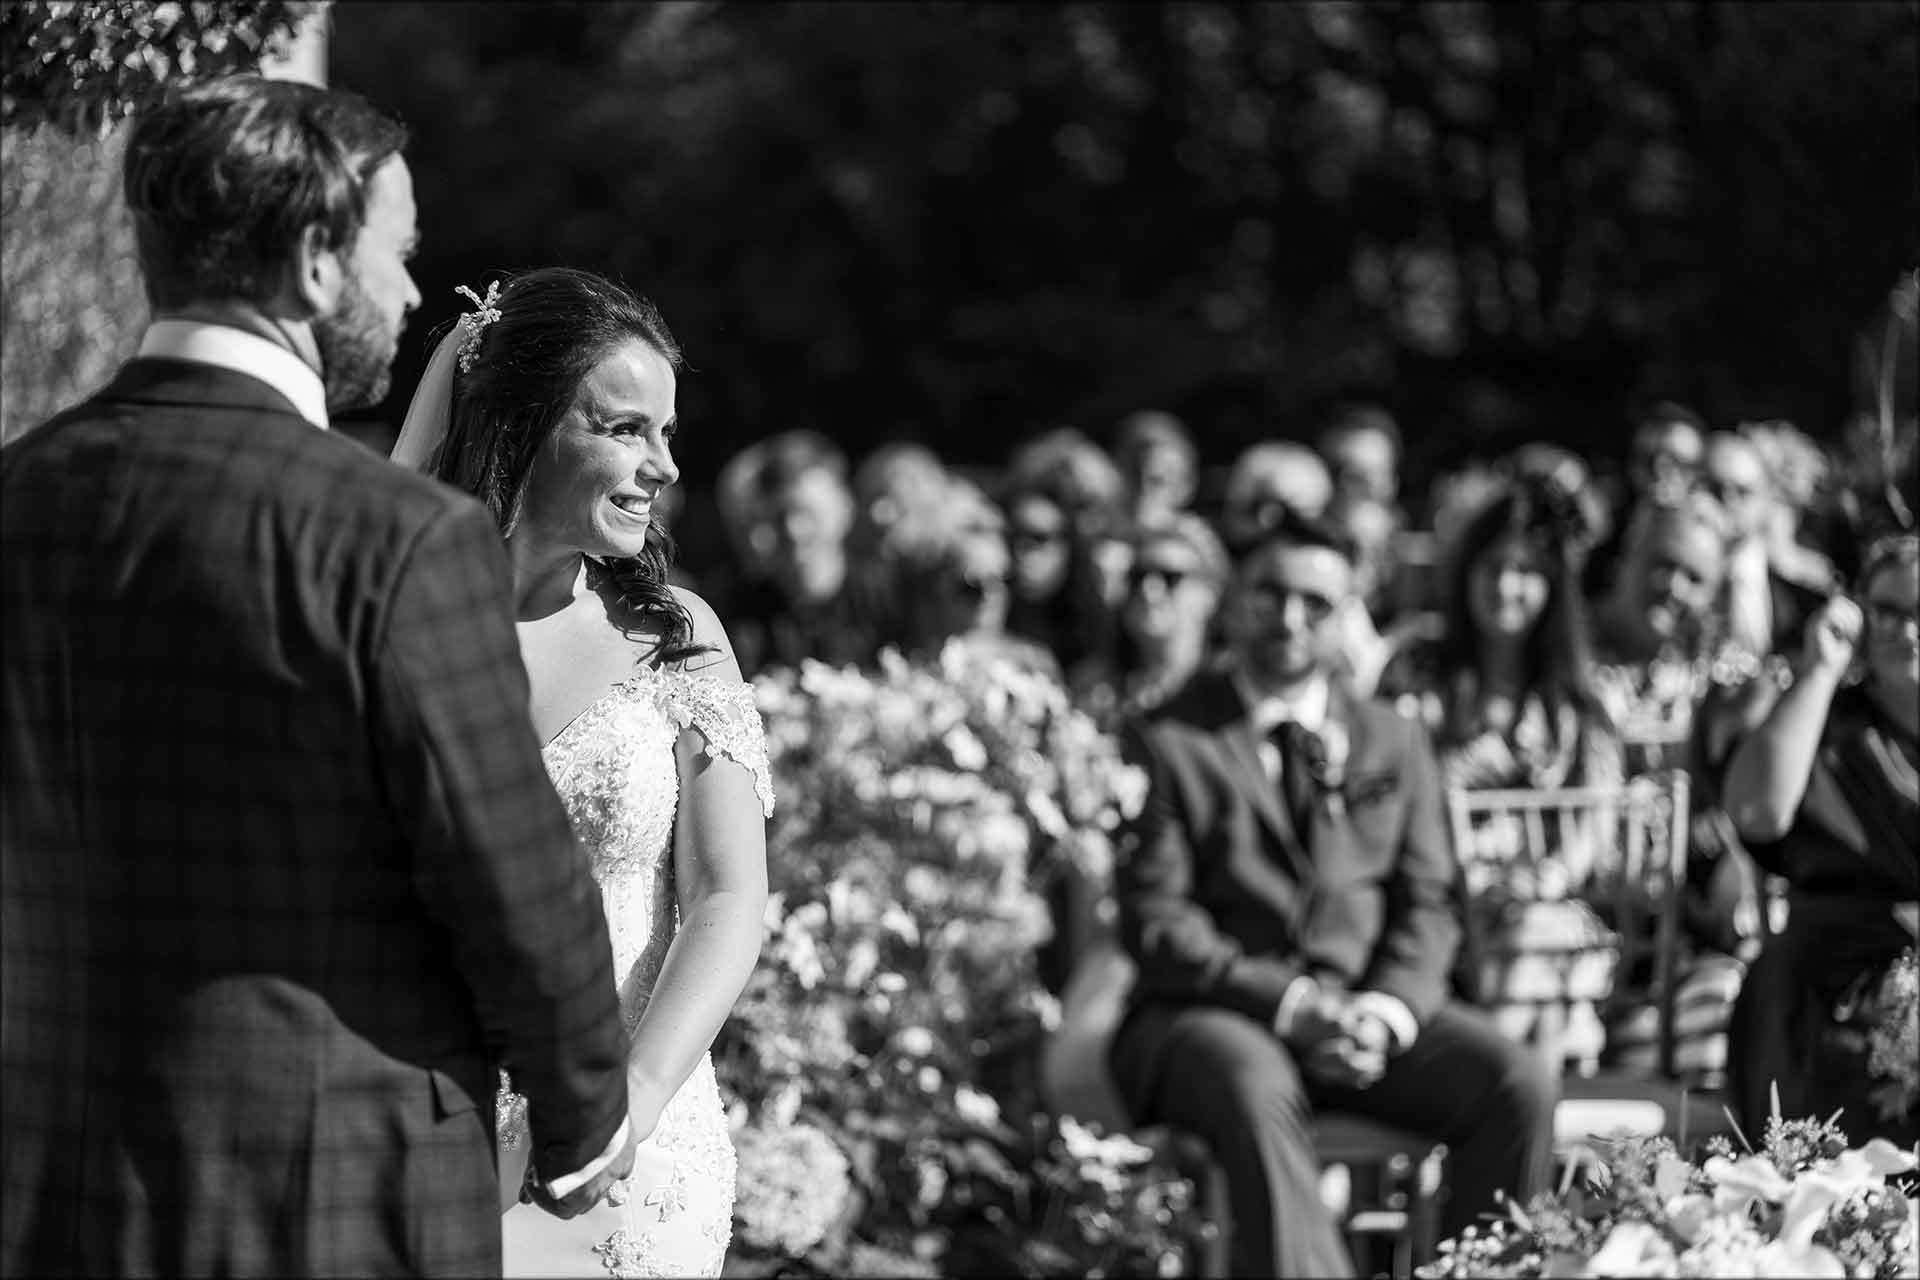 Bride and groom's outdoor wedding ceremony